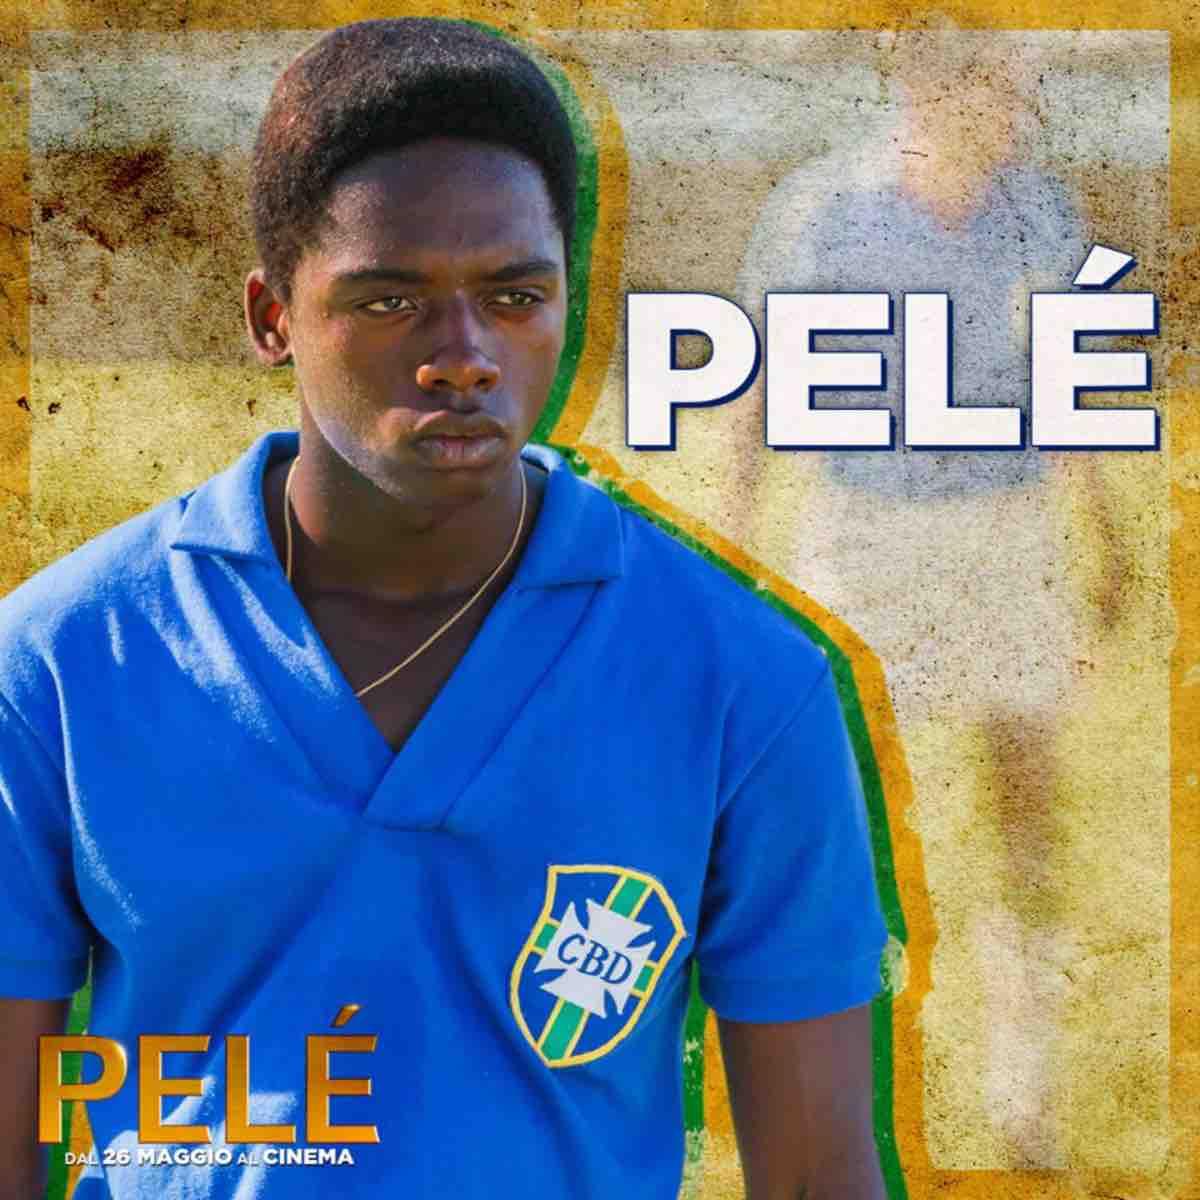 Pelé, stasera su Canale 5 il film: curiosità, cast e trama